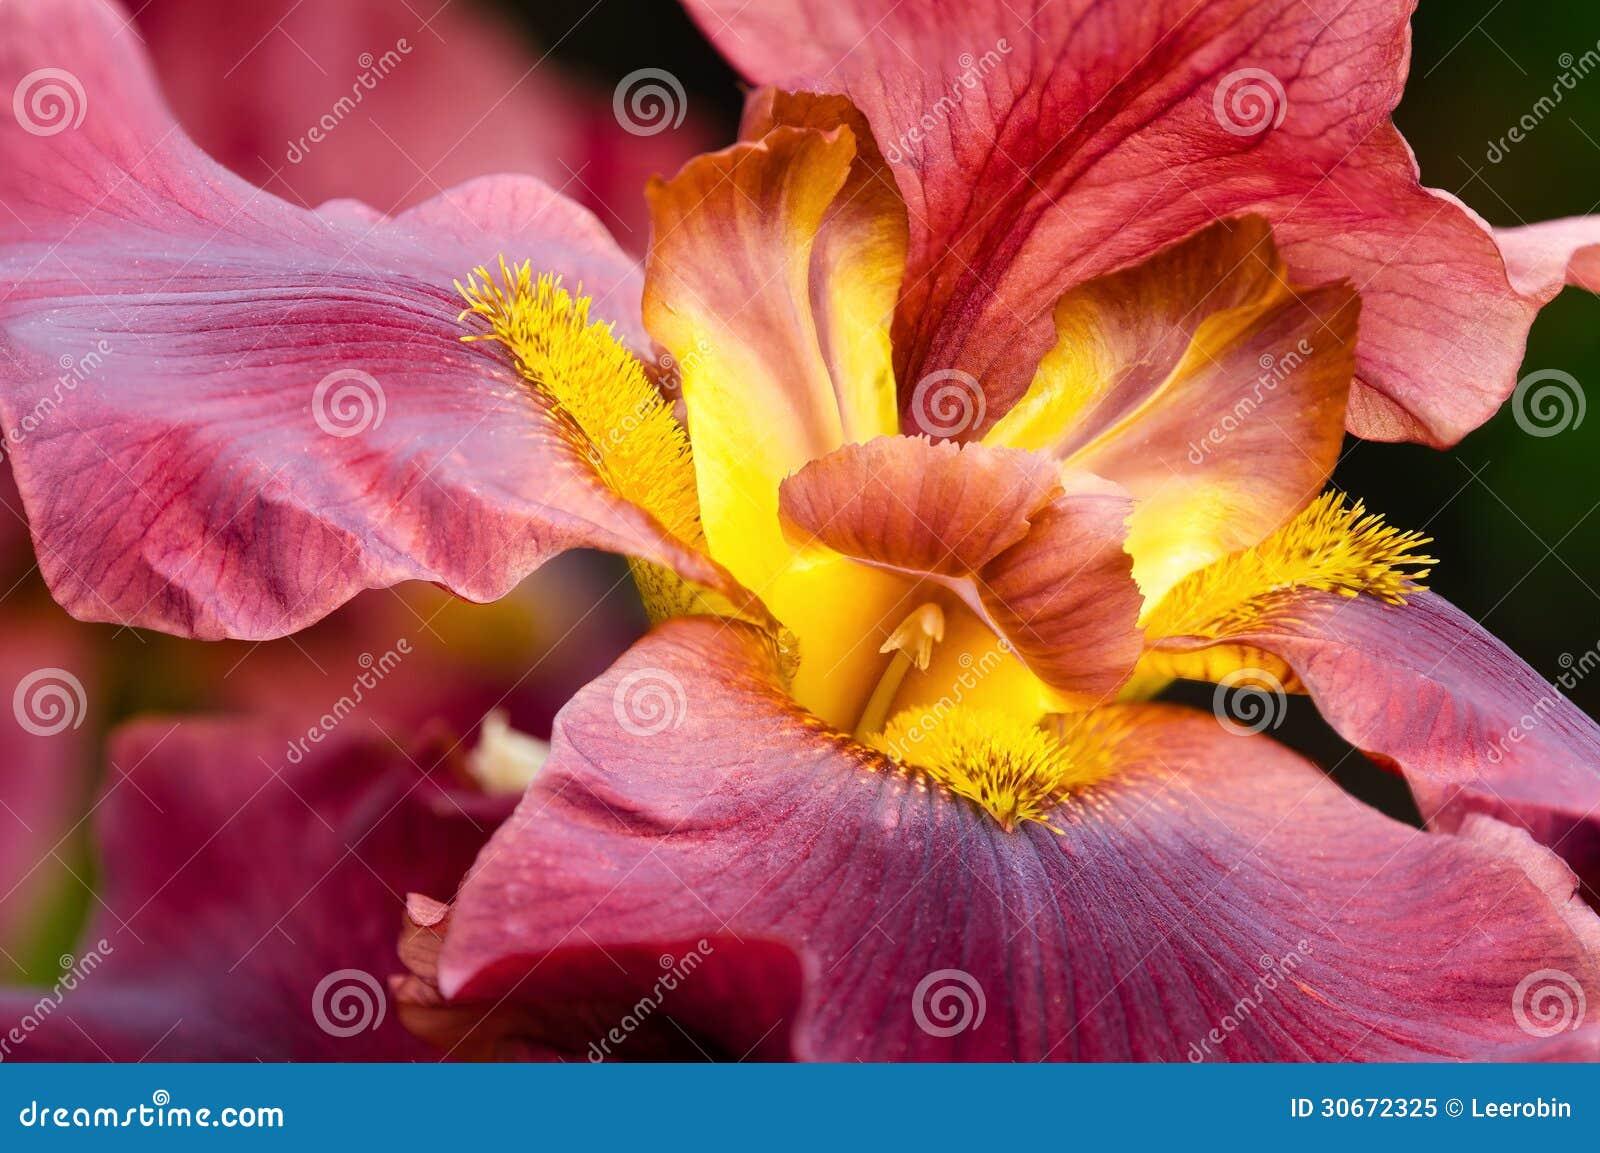 Closeup of Iris flower